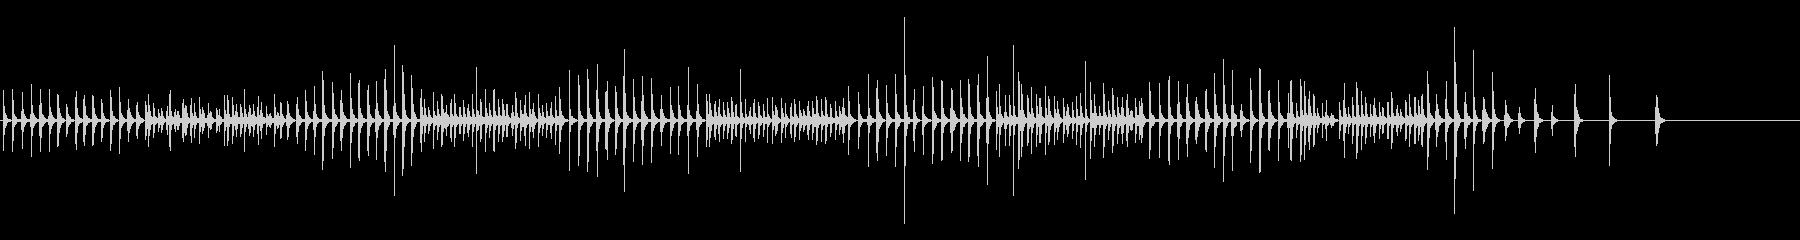 木琴16歌舞伎黒御簾下座音楽和風日本マリの未再生の波形